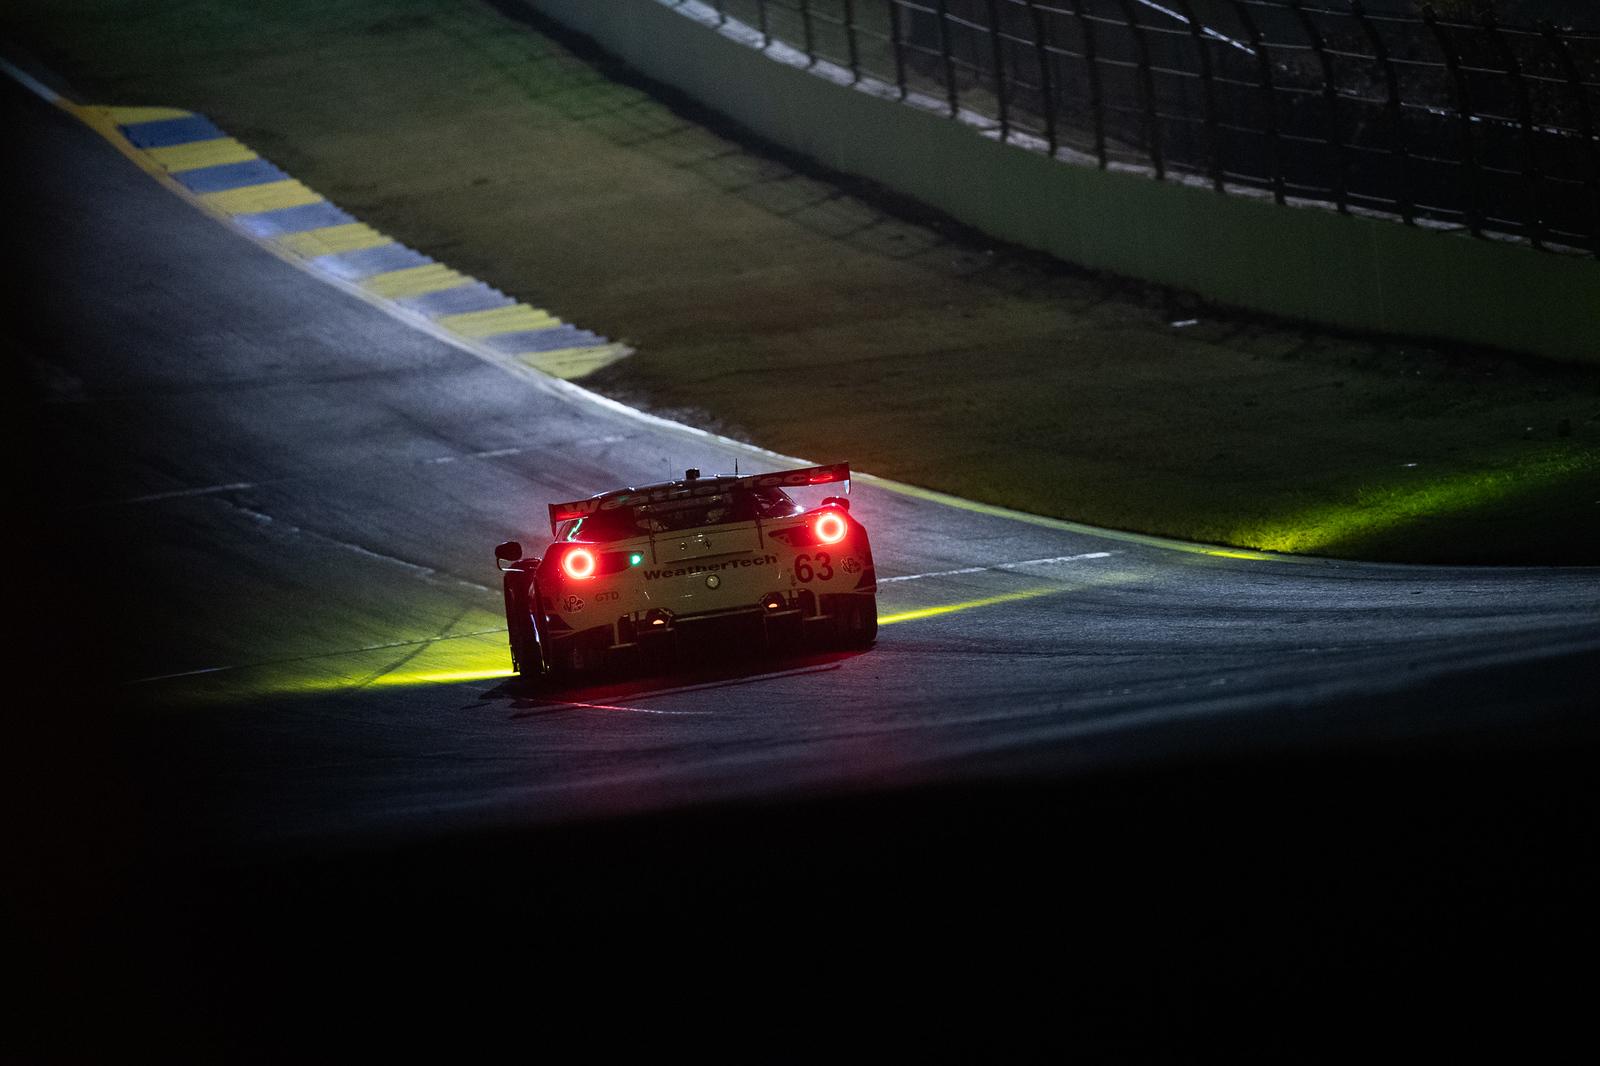 Ferrari on the track at night.